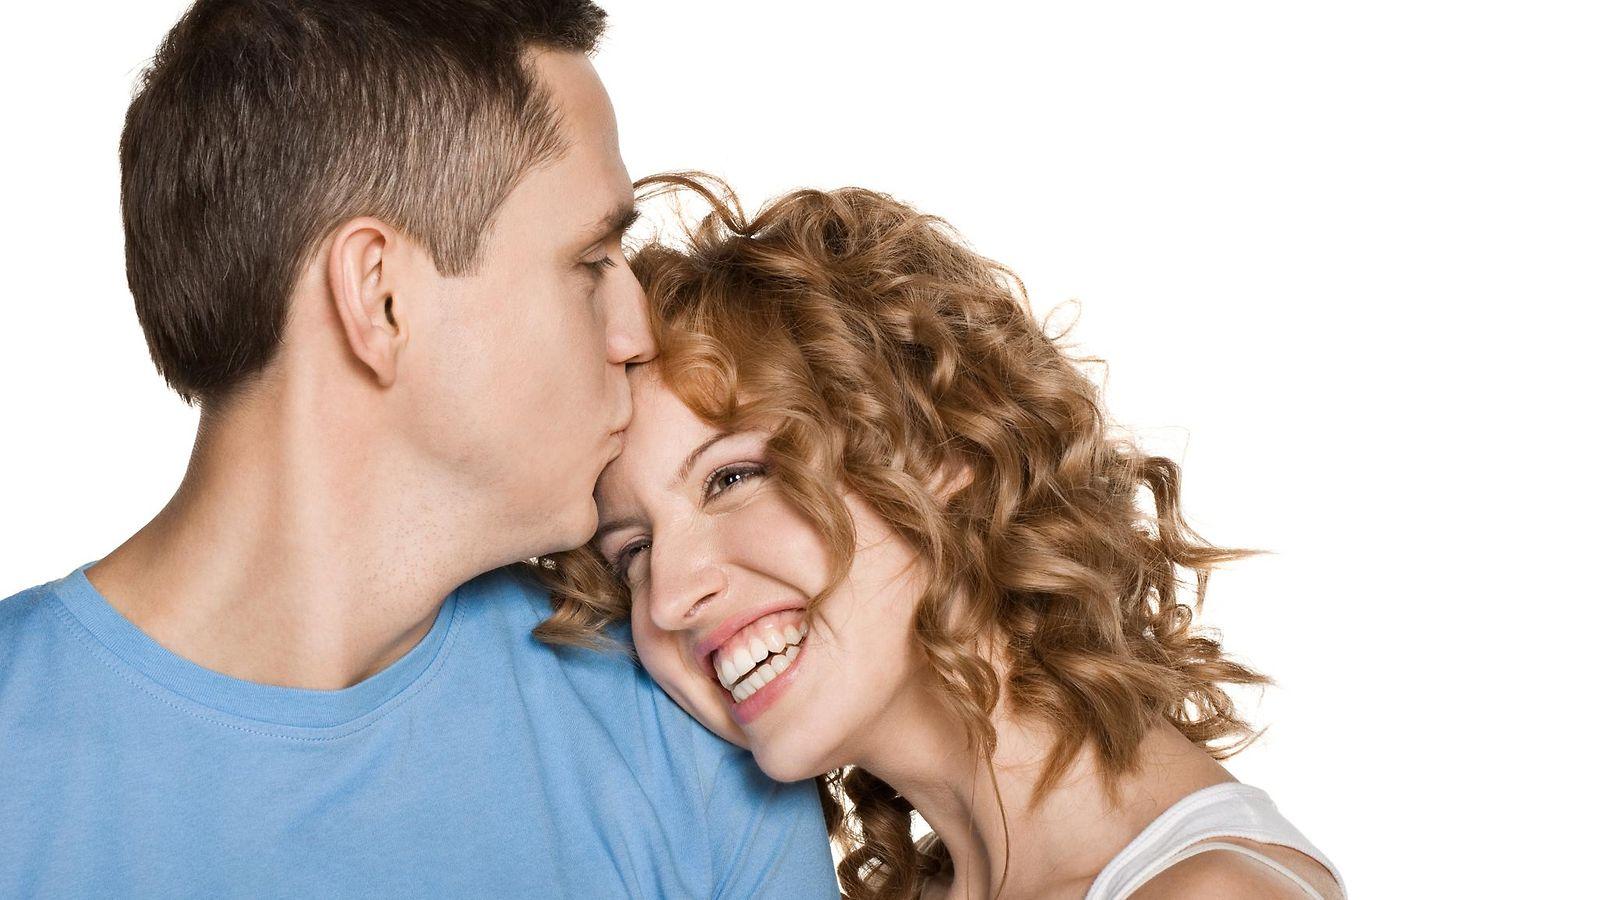 Kompensoitu dating hallitus